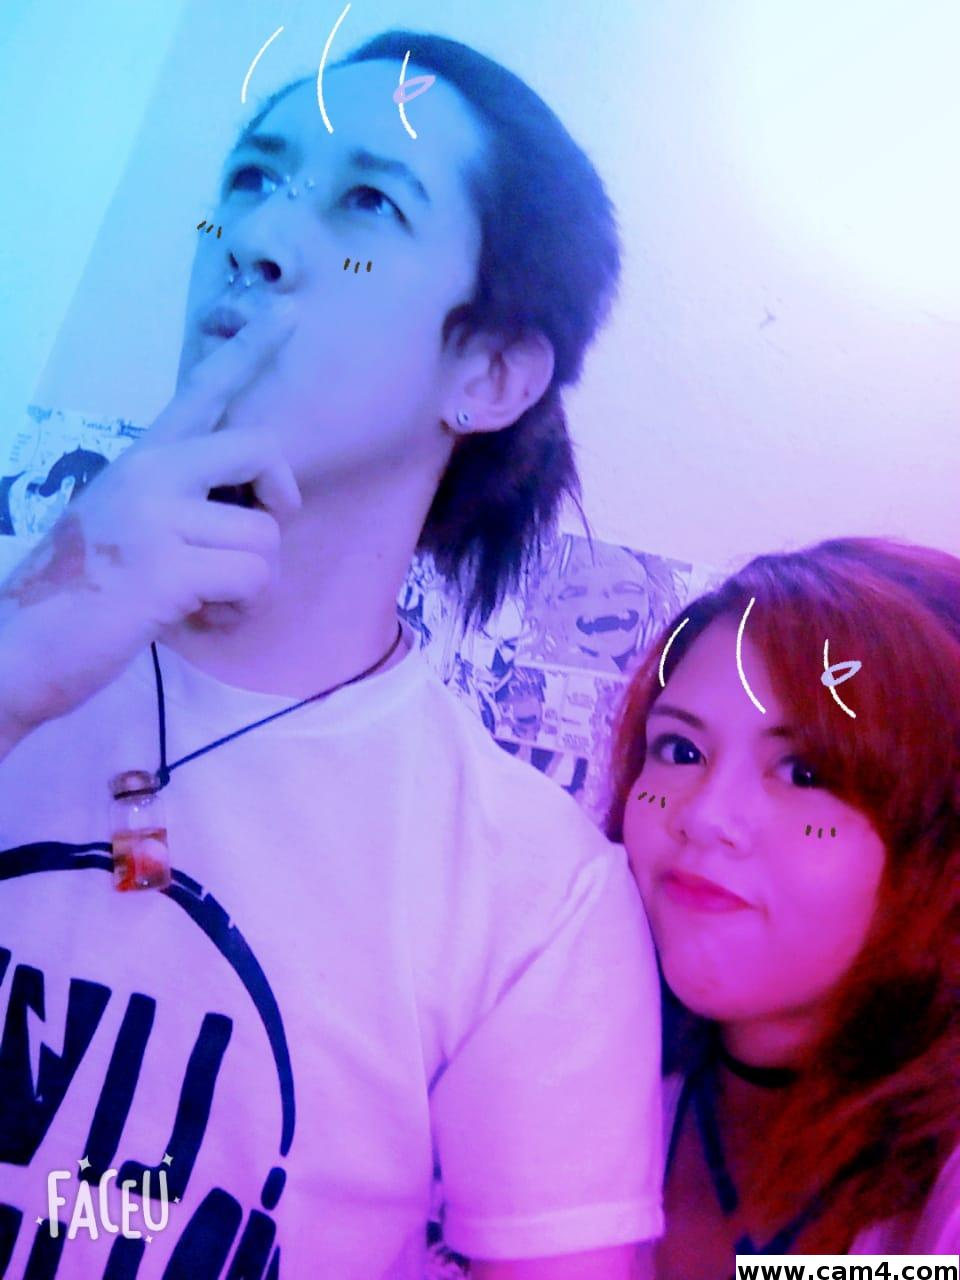 Nakko and tsuki?s=bavfekvwcol2bvjiph3dhl8c+qdnk210ytxi5bukzee=